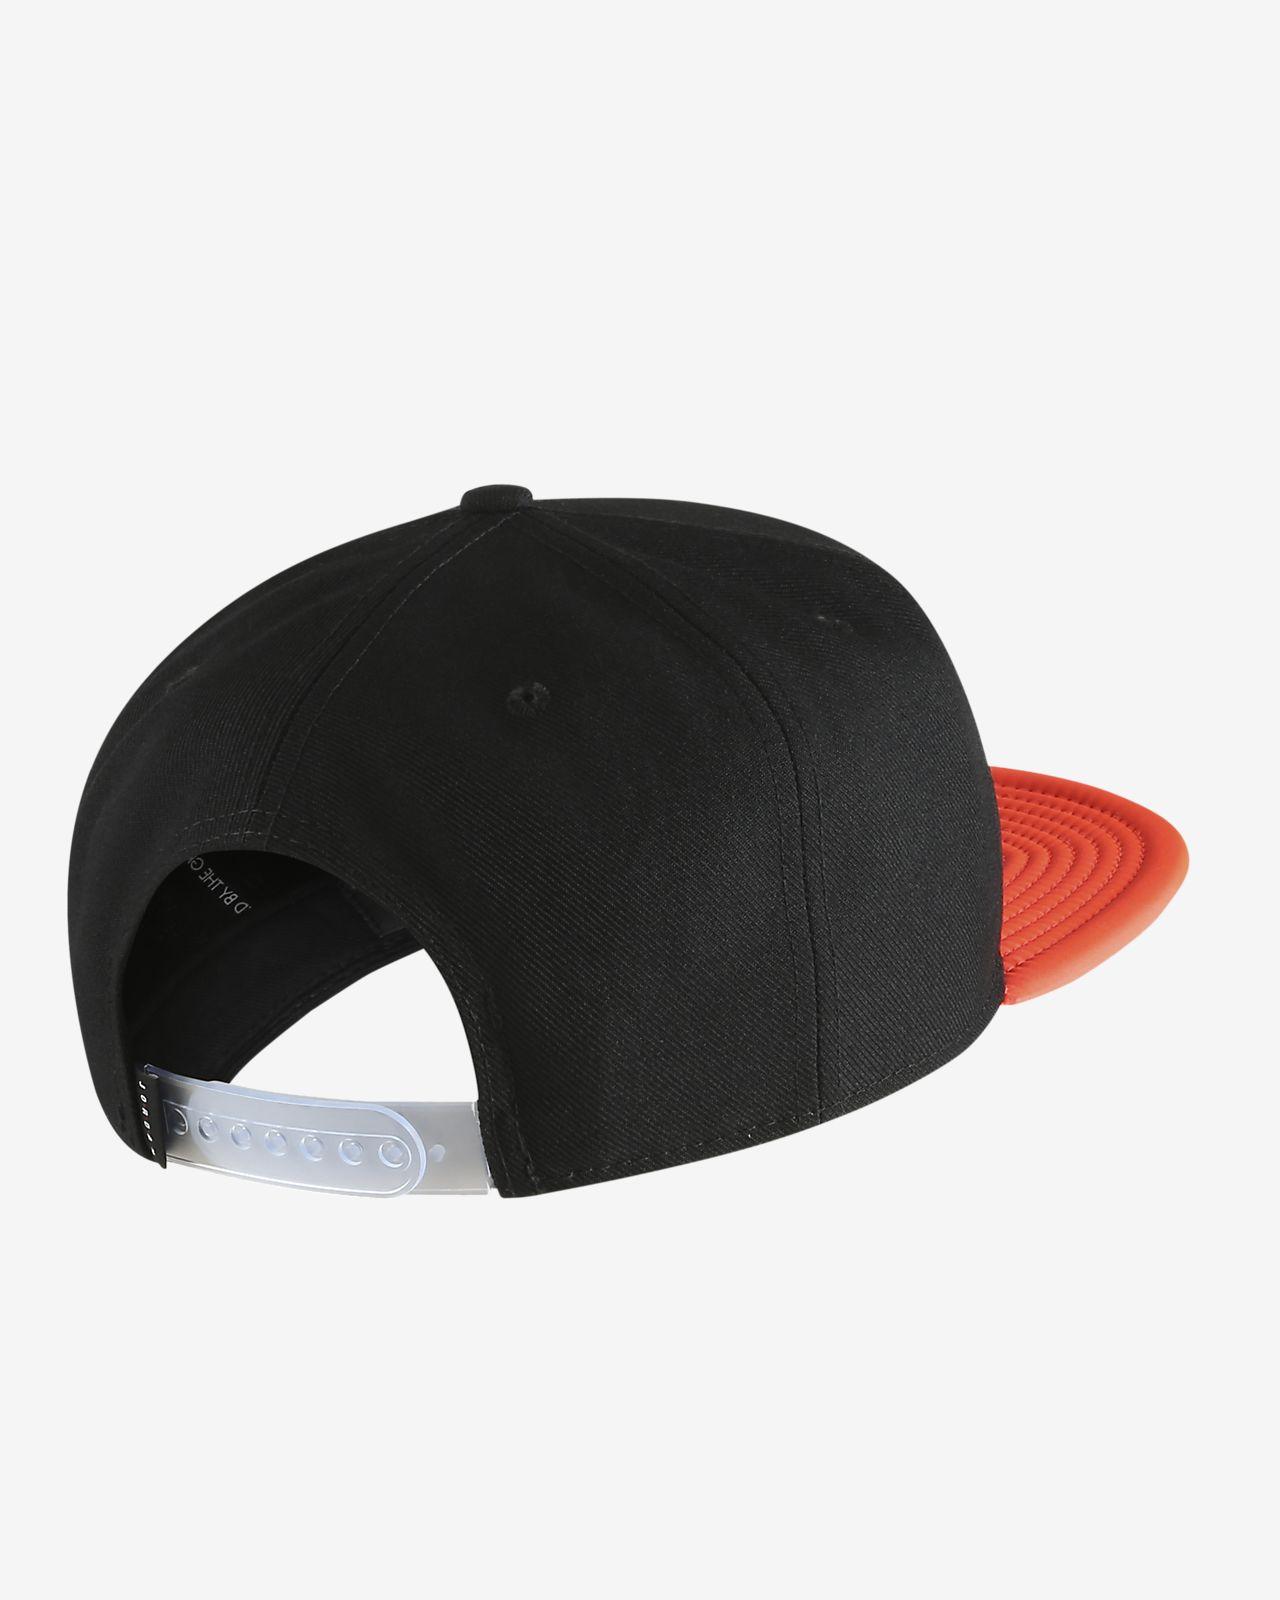 25a83101209bd5 Jordan Pro Legacy Jumpman Air Hat. Nike.com